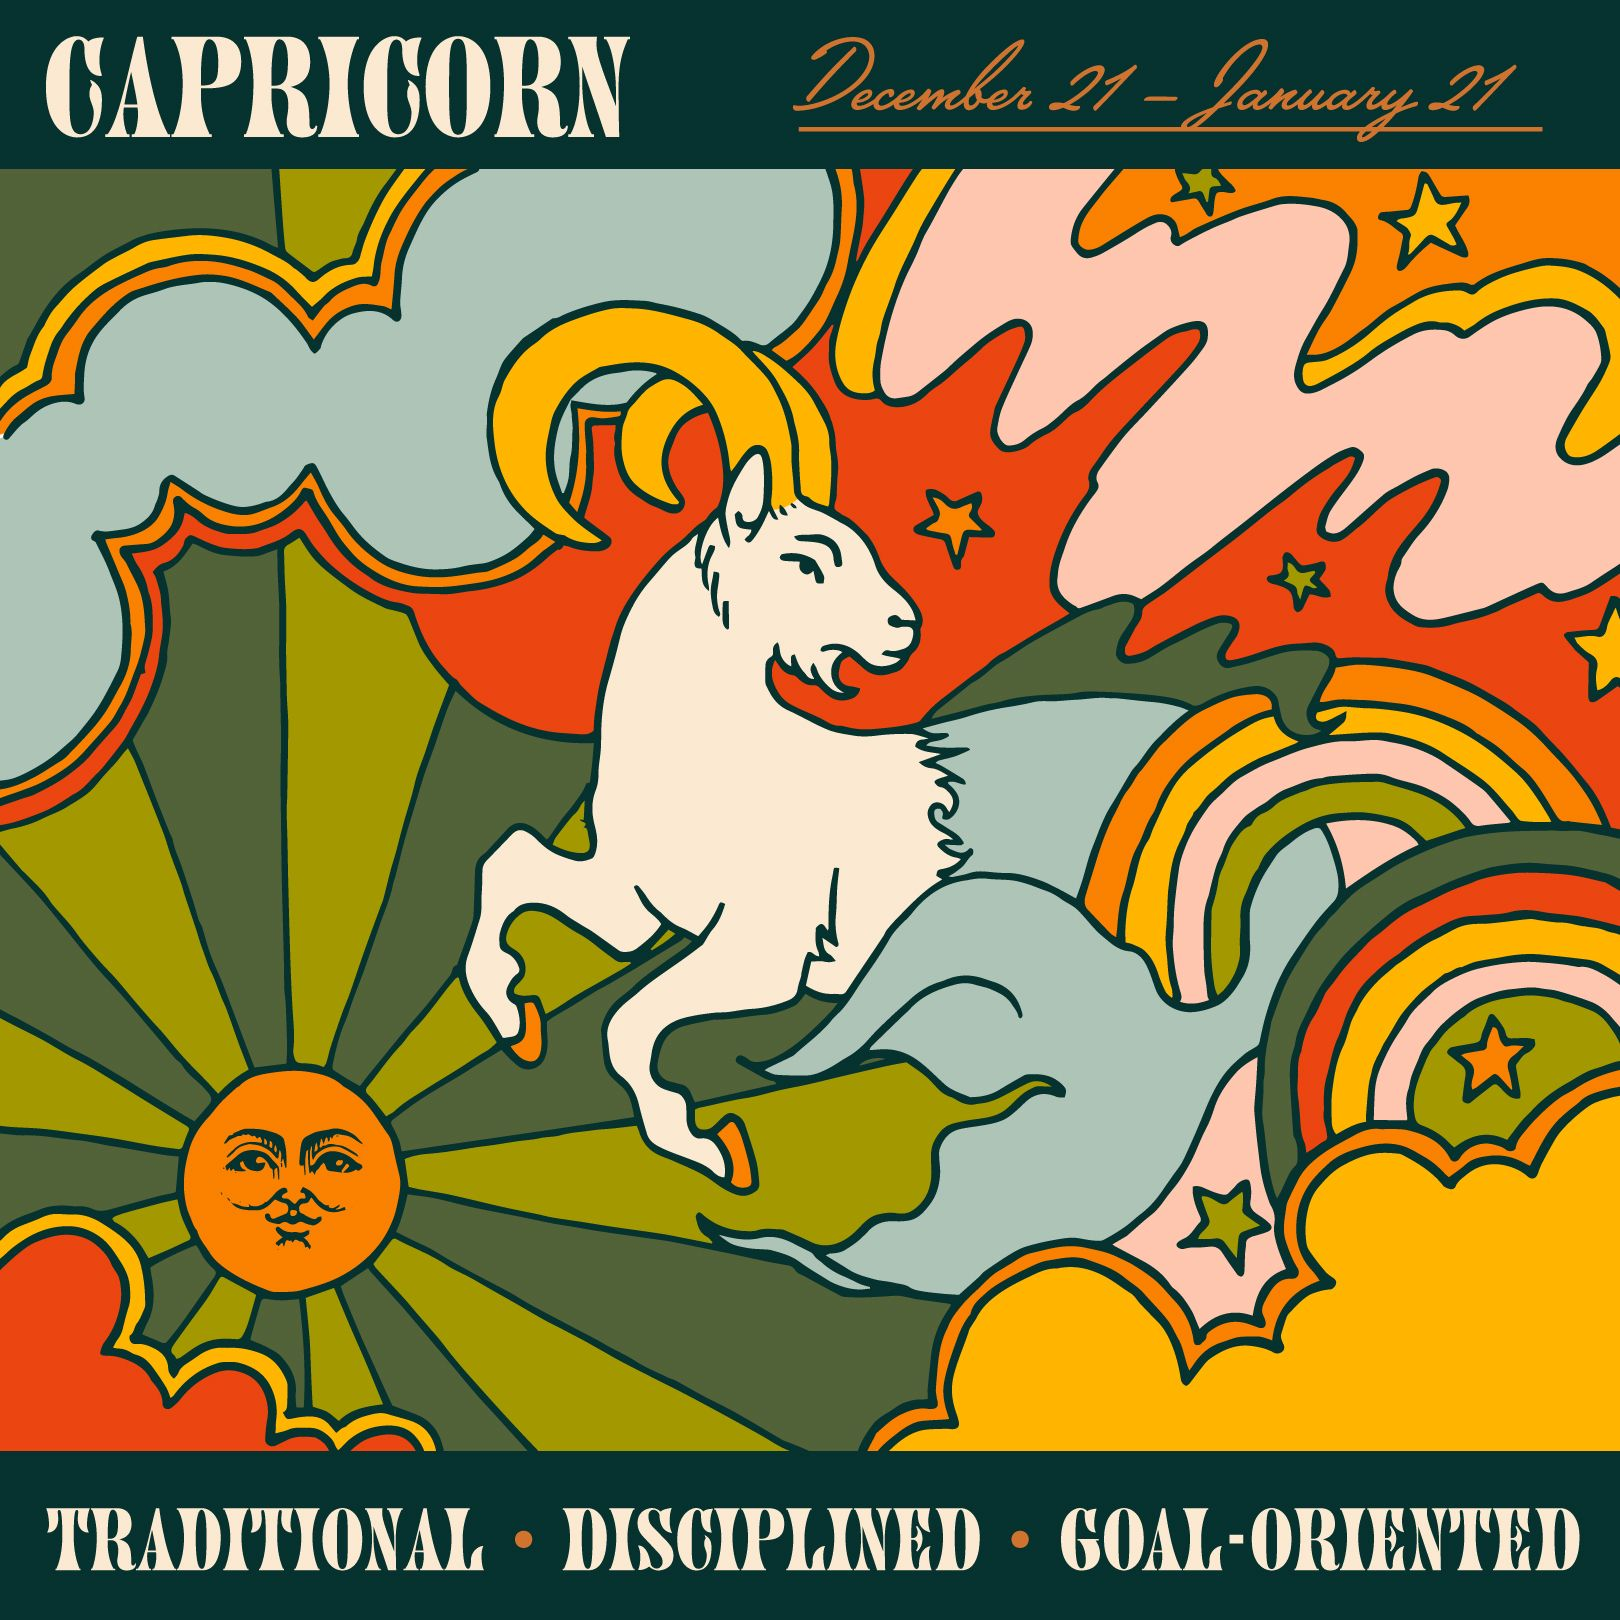 Capricorn Season